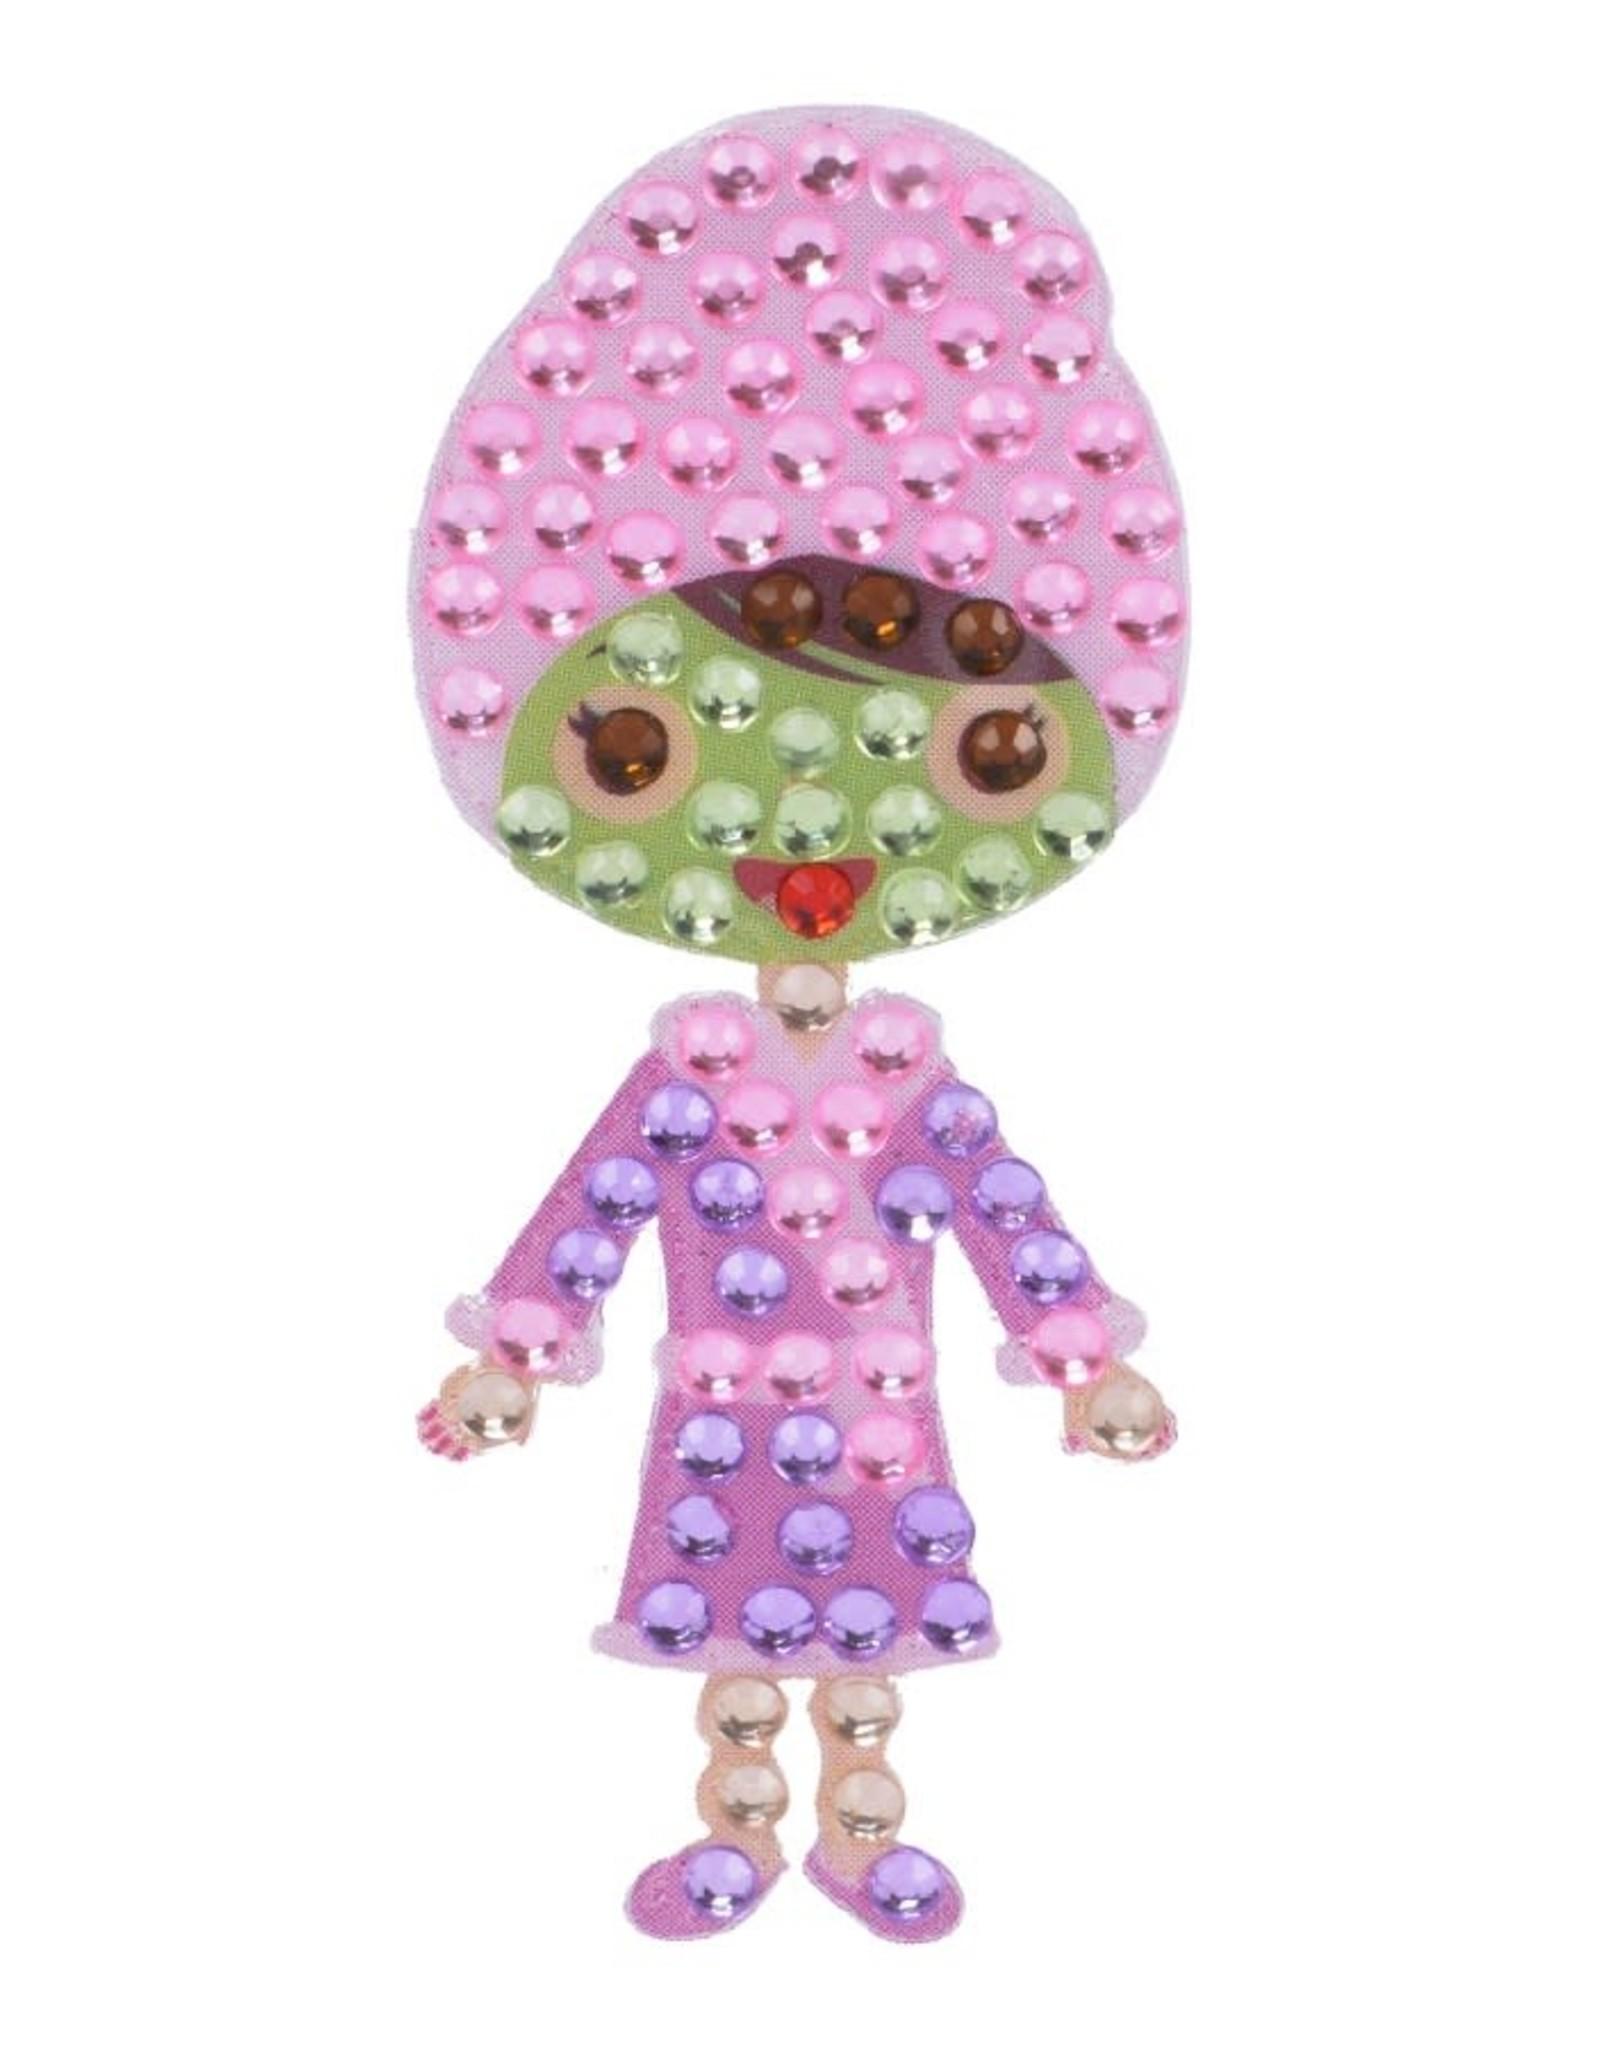 Sticker Beans Sticker Beans Spa Girl